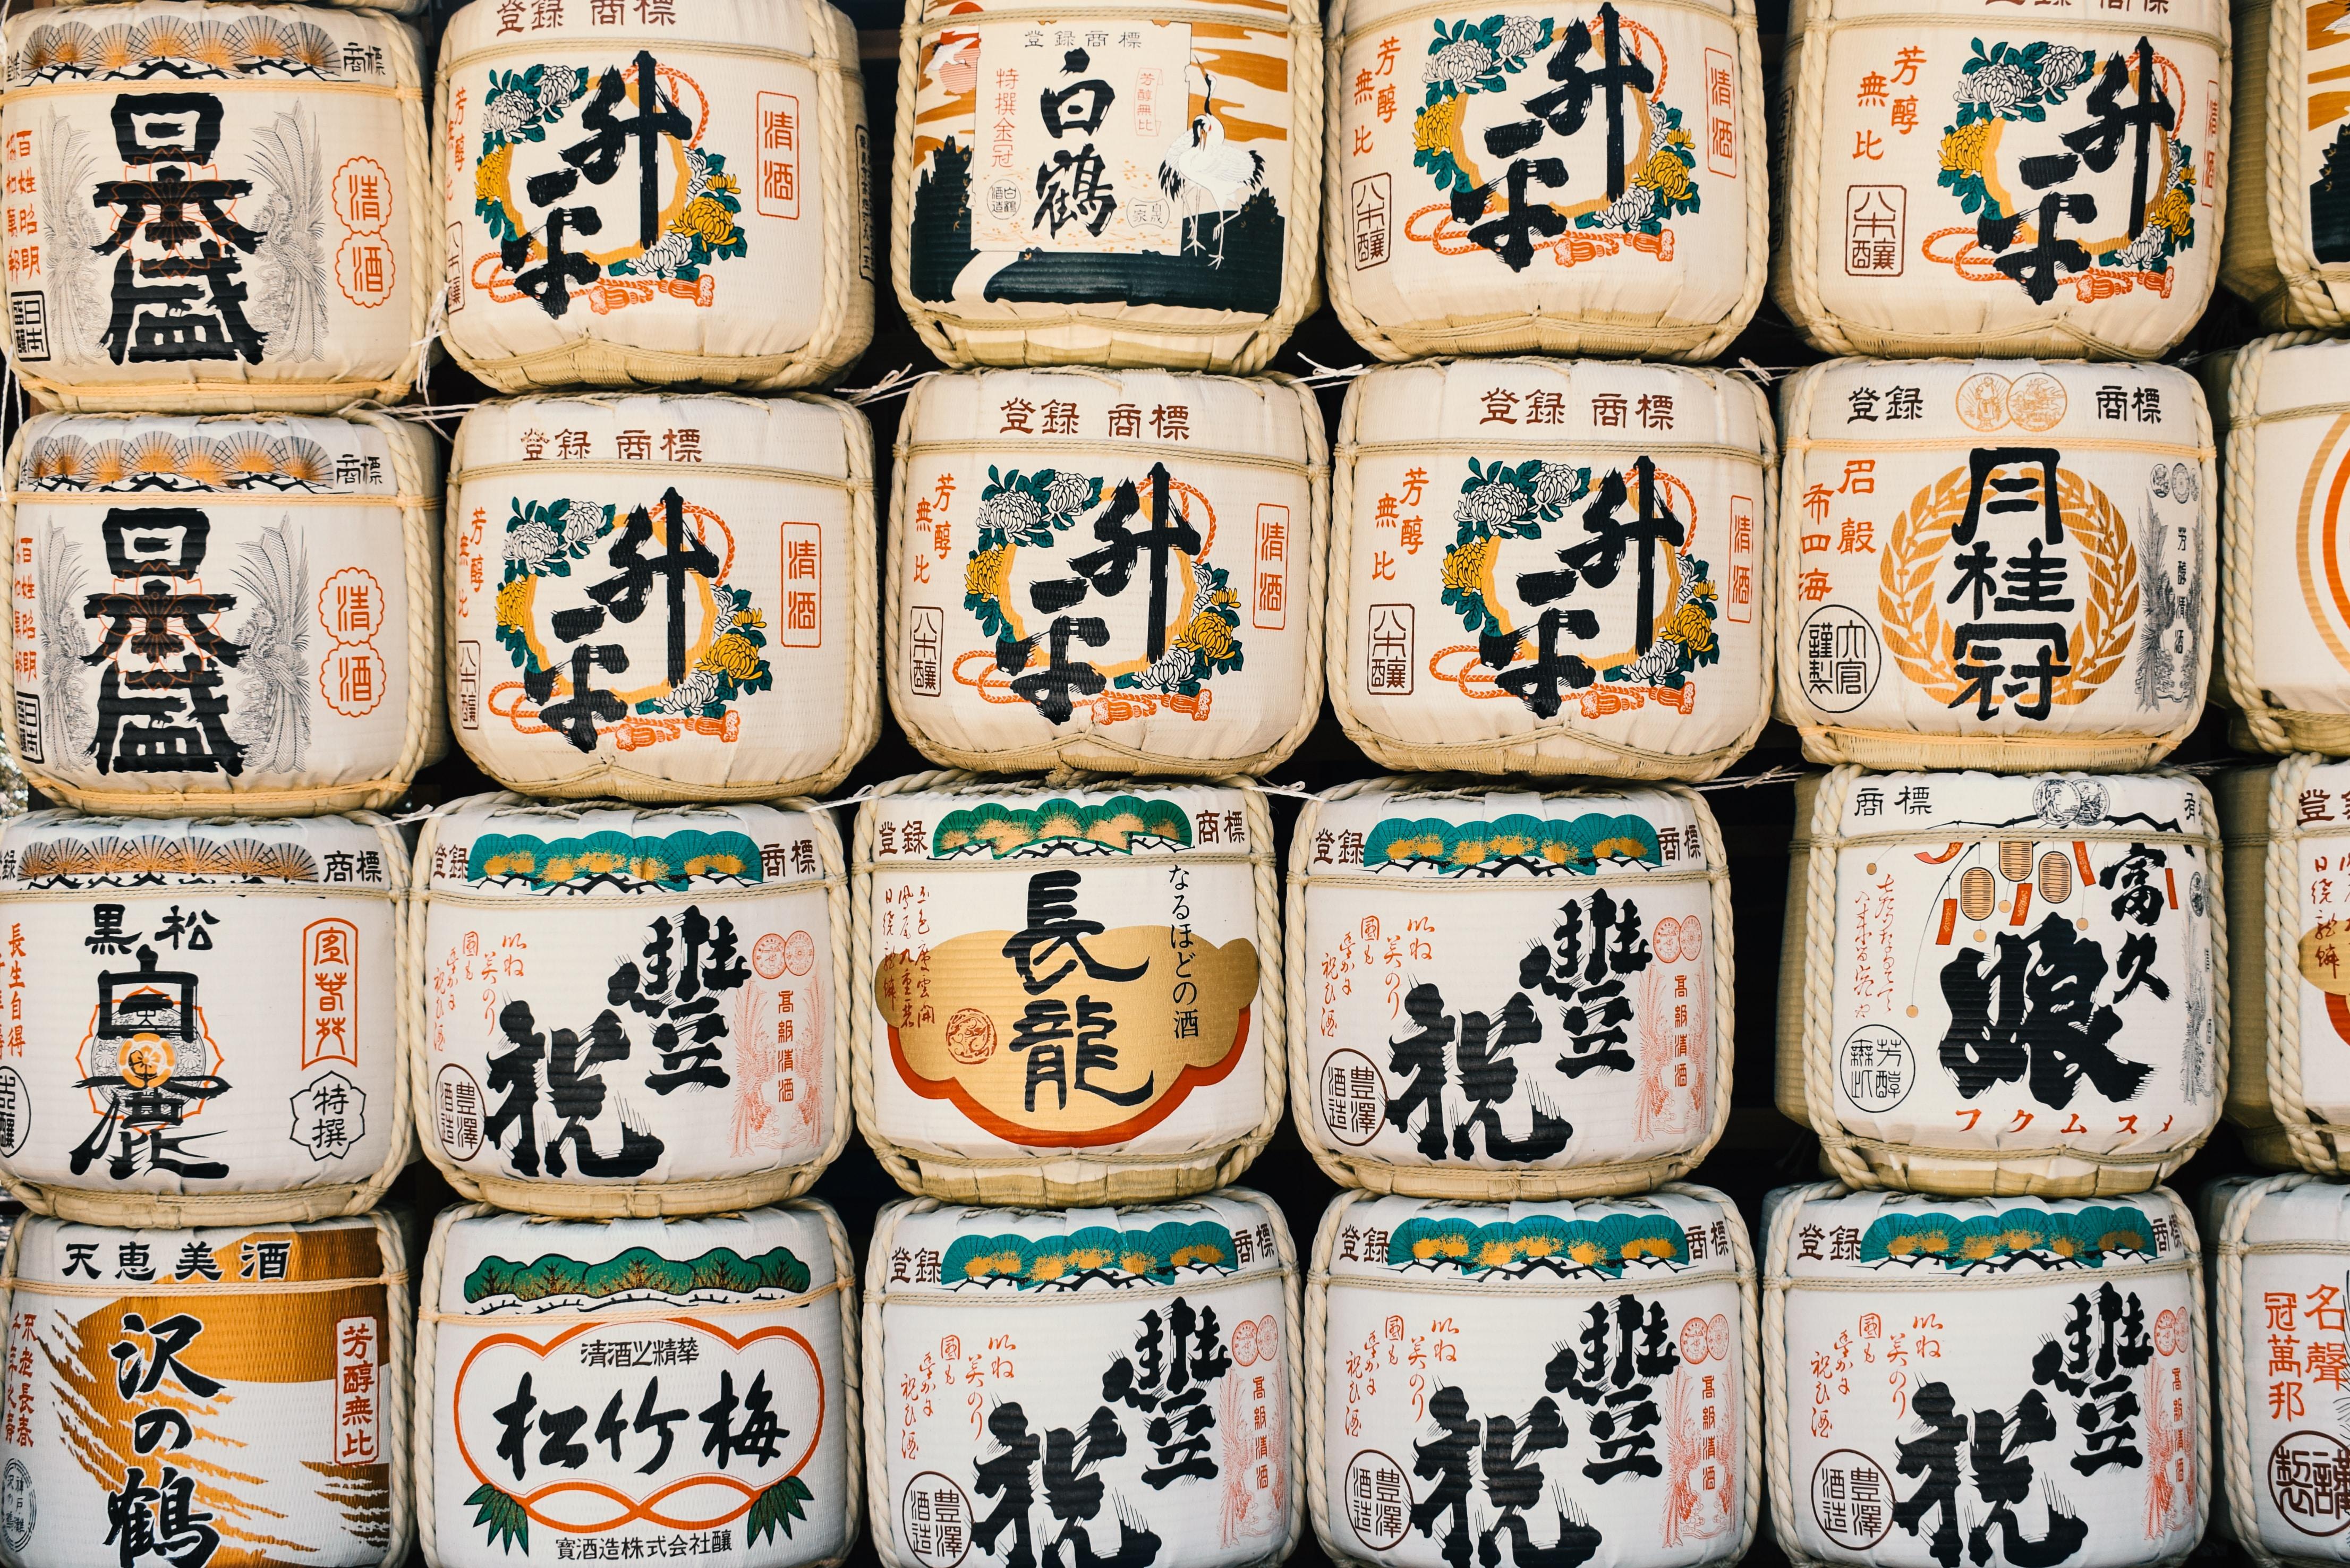 kanji-script printed box lot